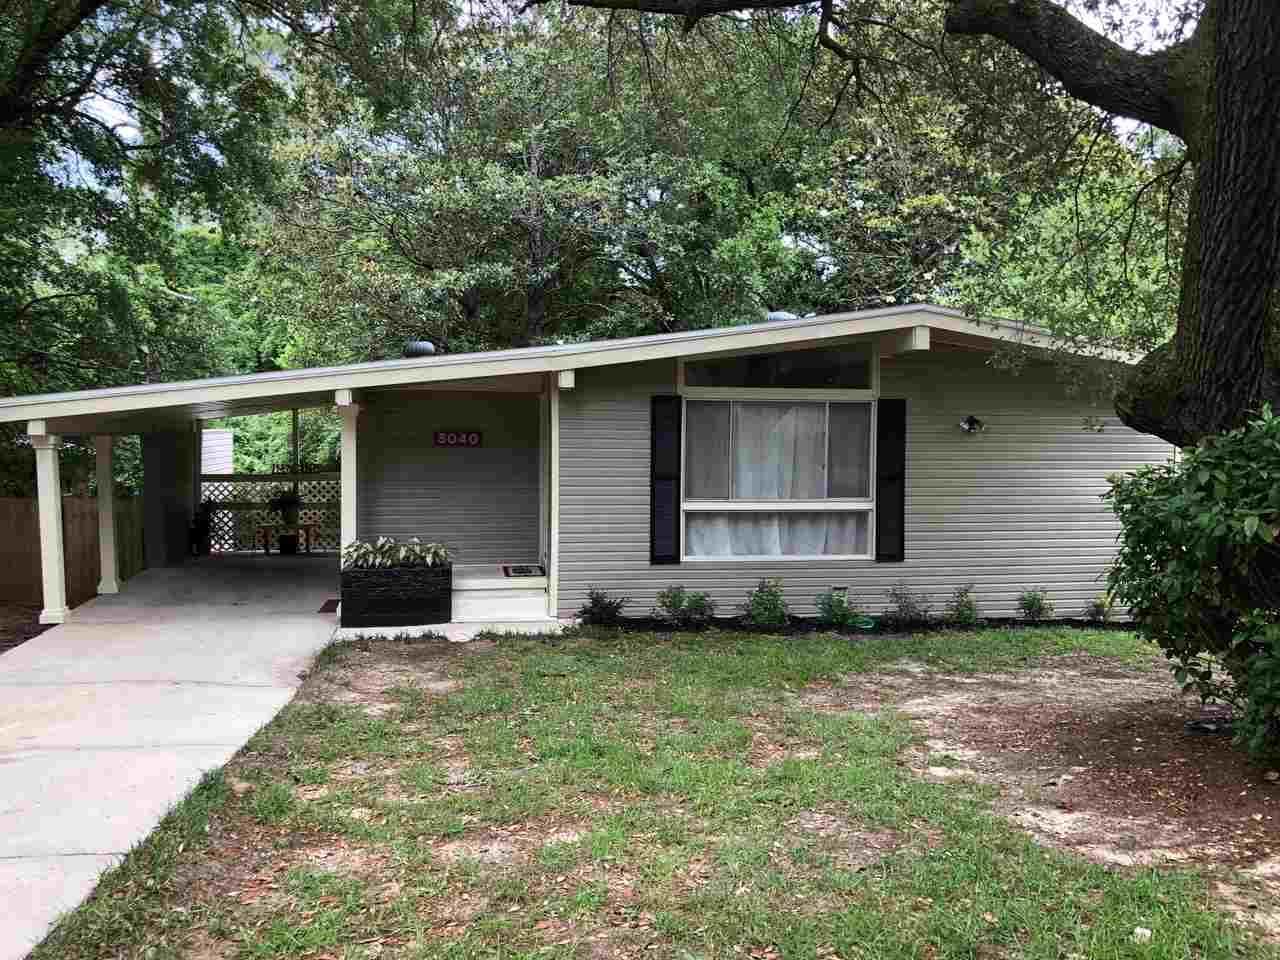 5040 Springhill Dr, Pensacola, FL 32503